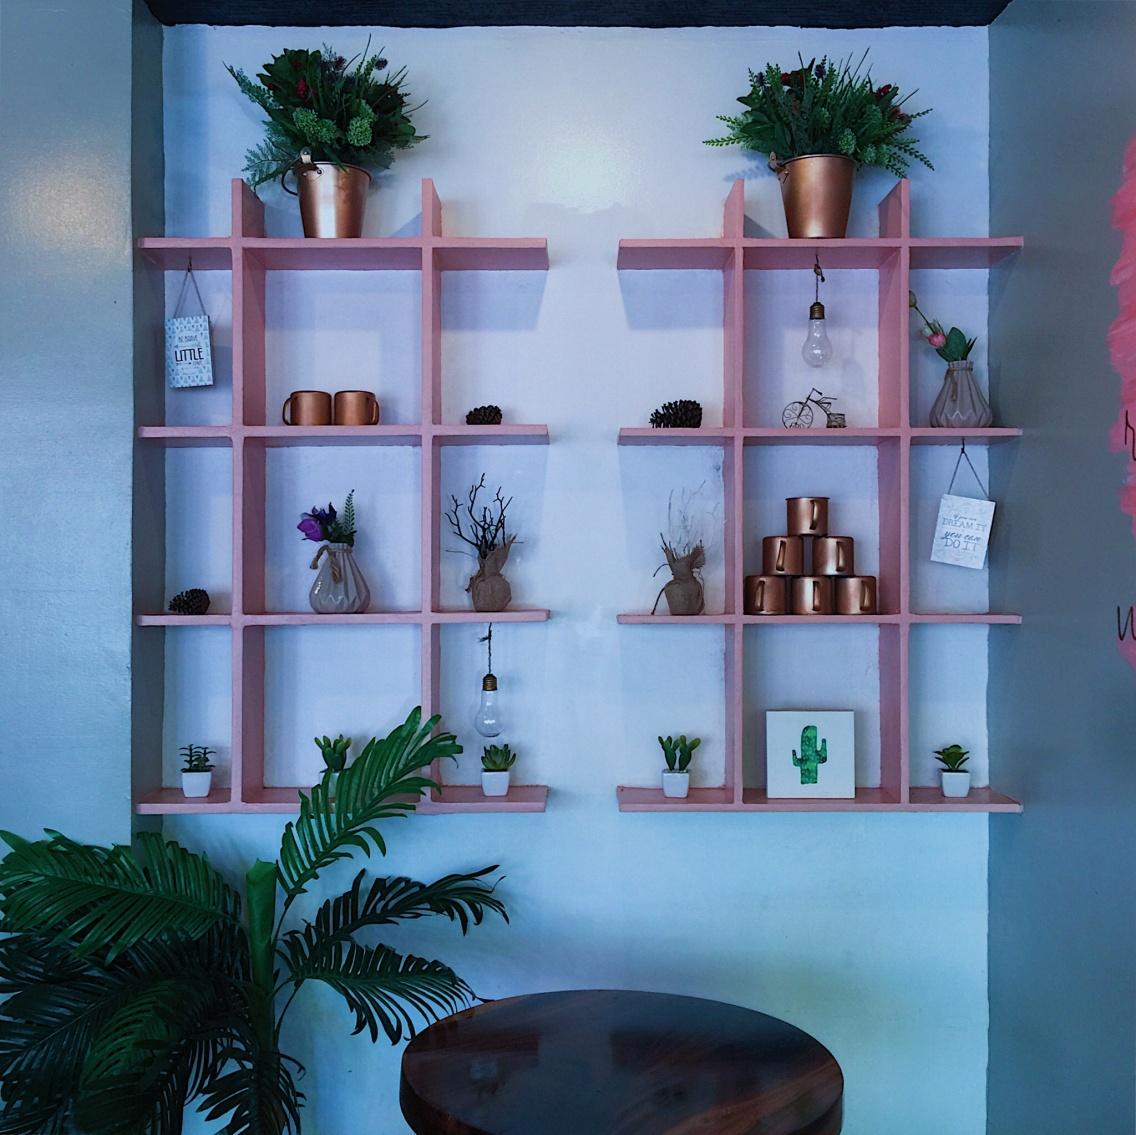 Cafe Vibes 1 3 Cafe Pastel Pink Blue Aesthetic Tamelavilla Vsco